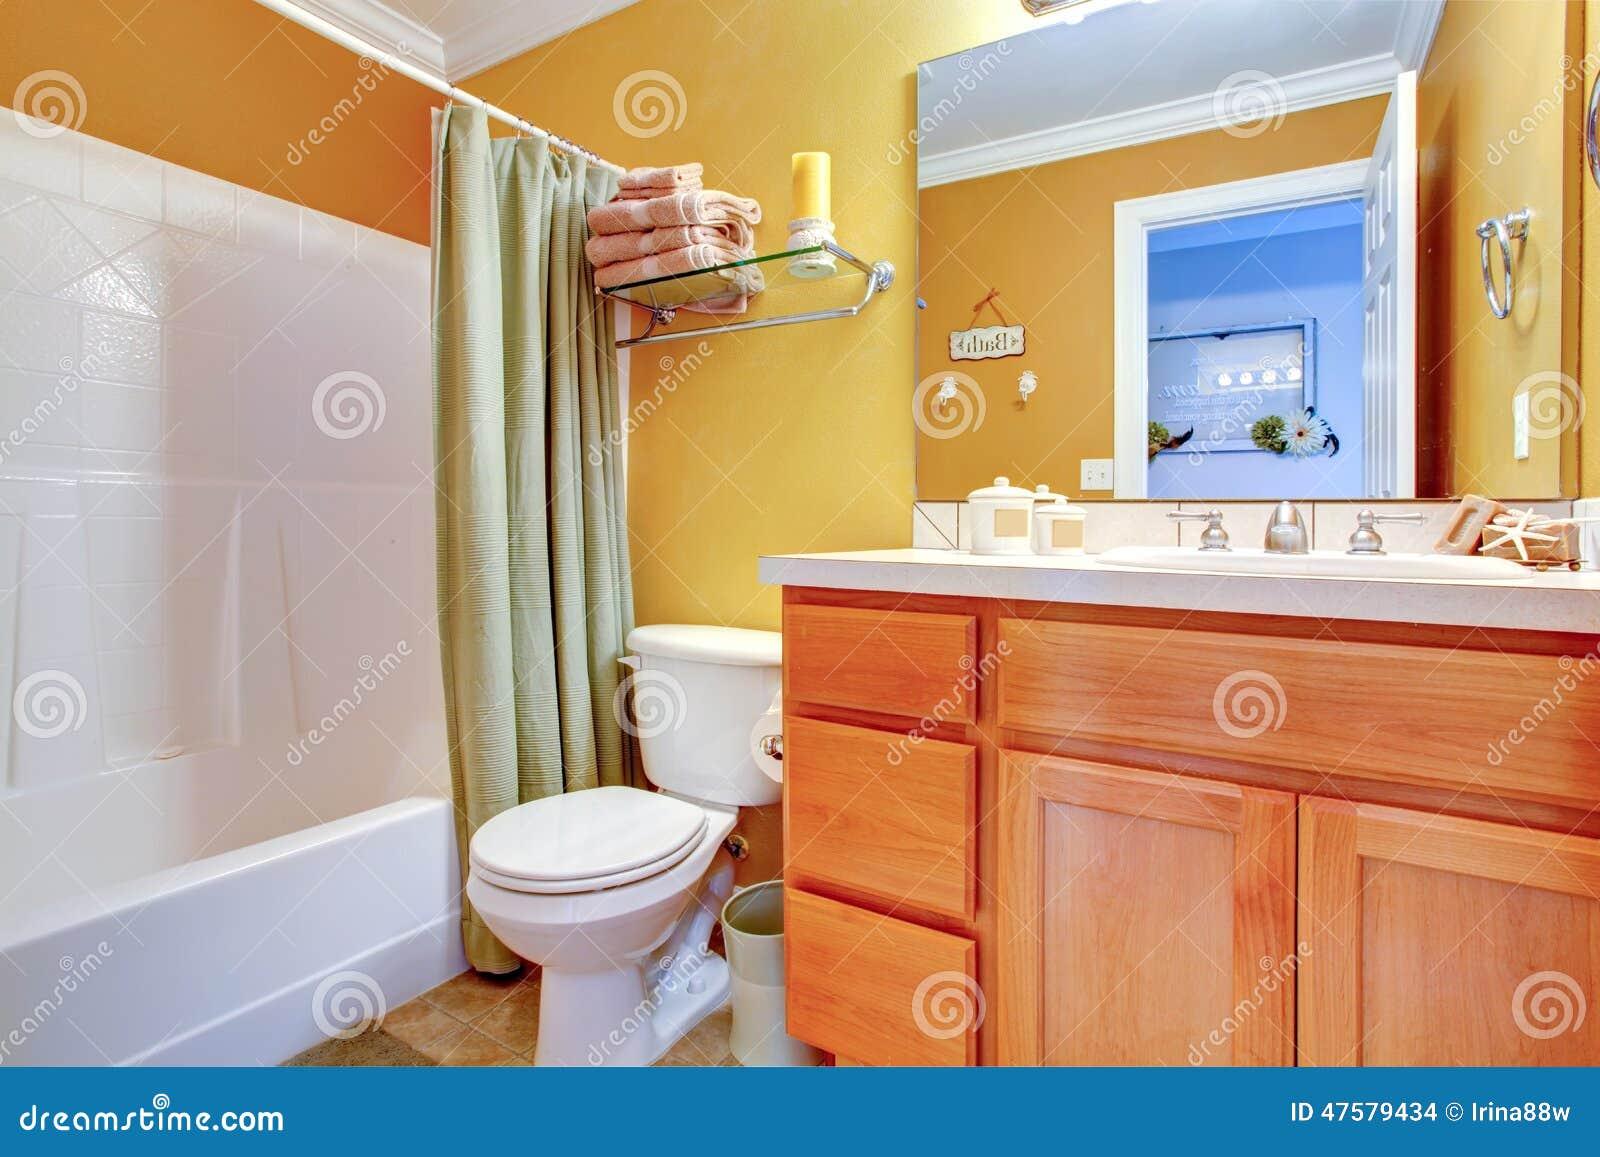 Bright yellow bathroom interior. Bright Yellow Bathroom Interior Stock Photo   Image  47579434